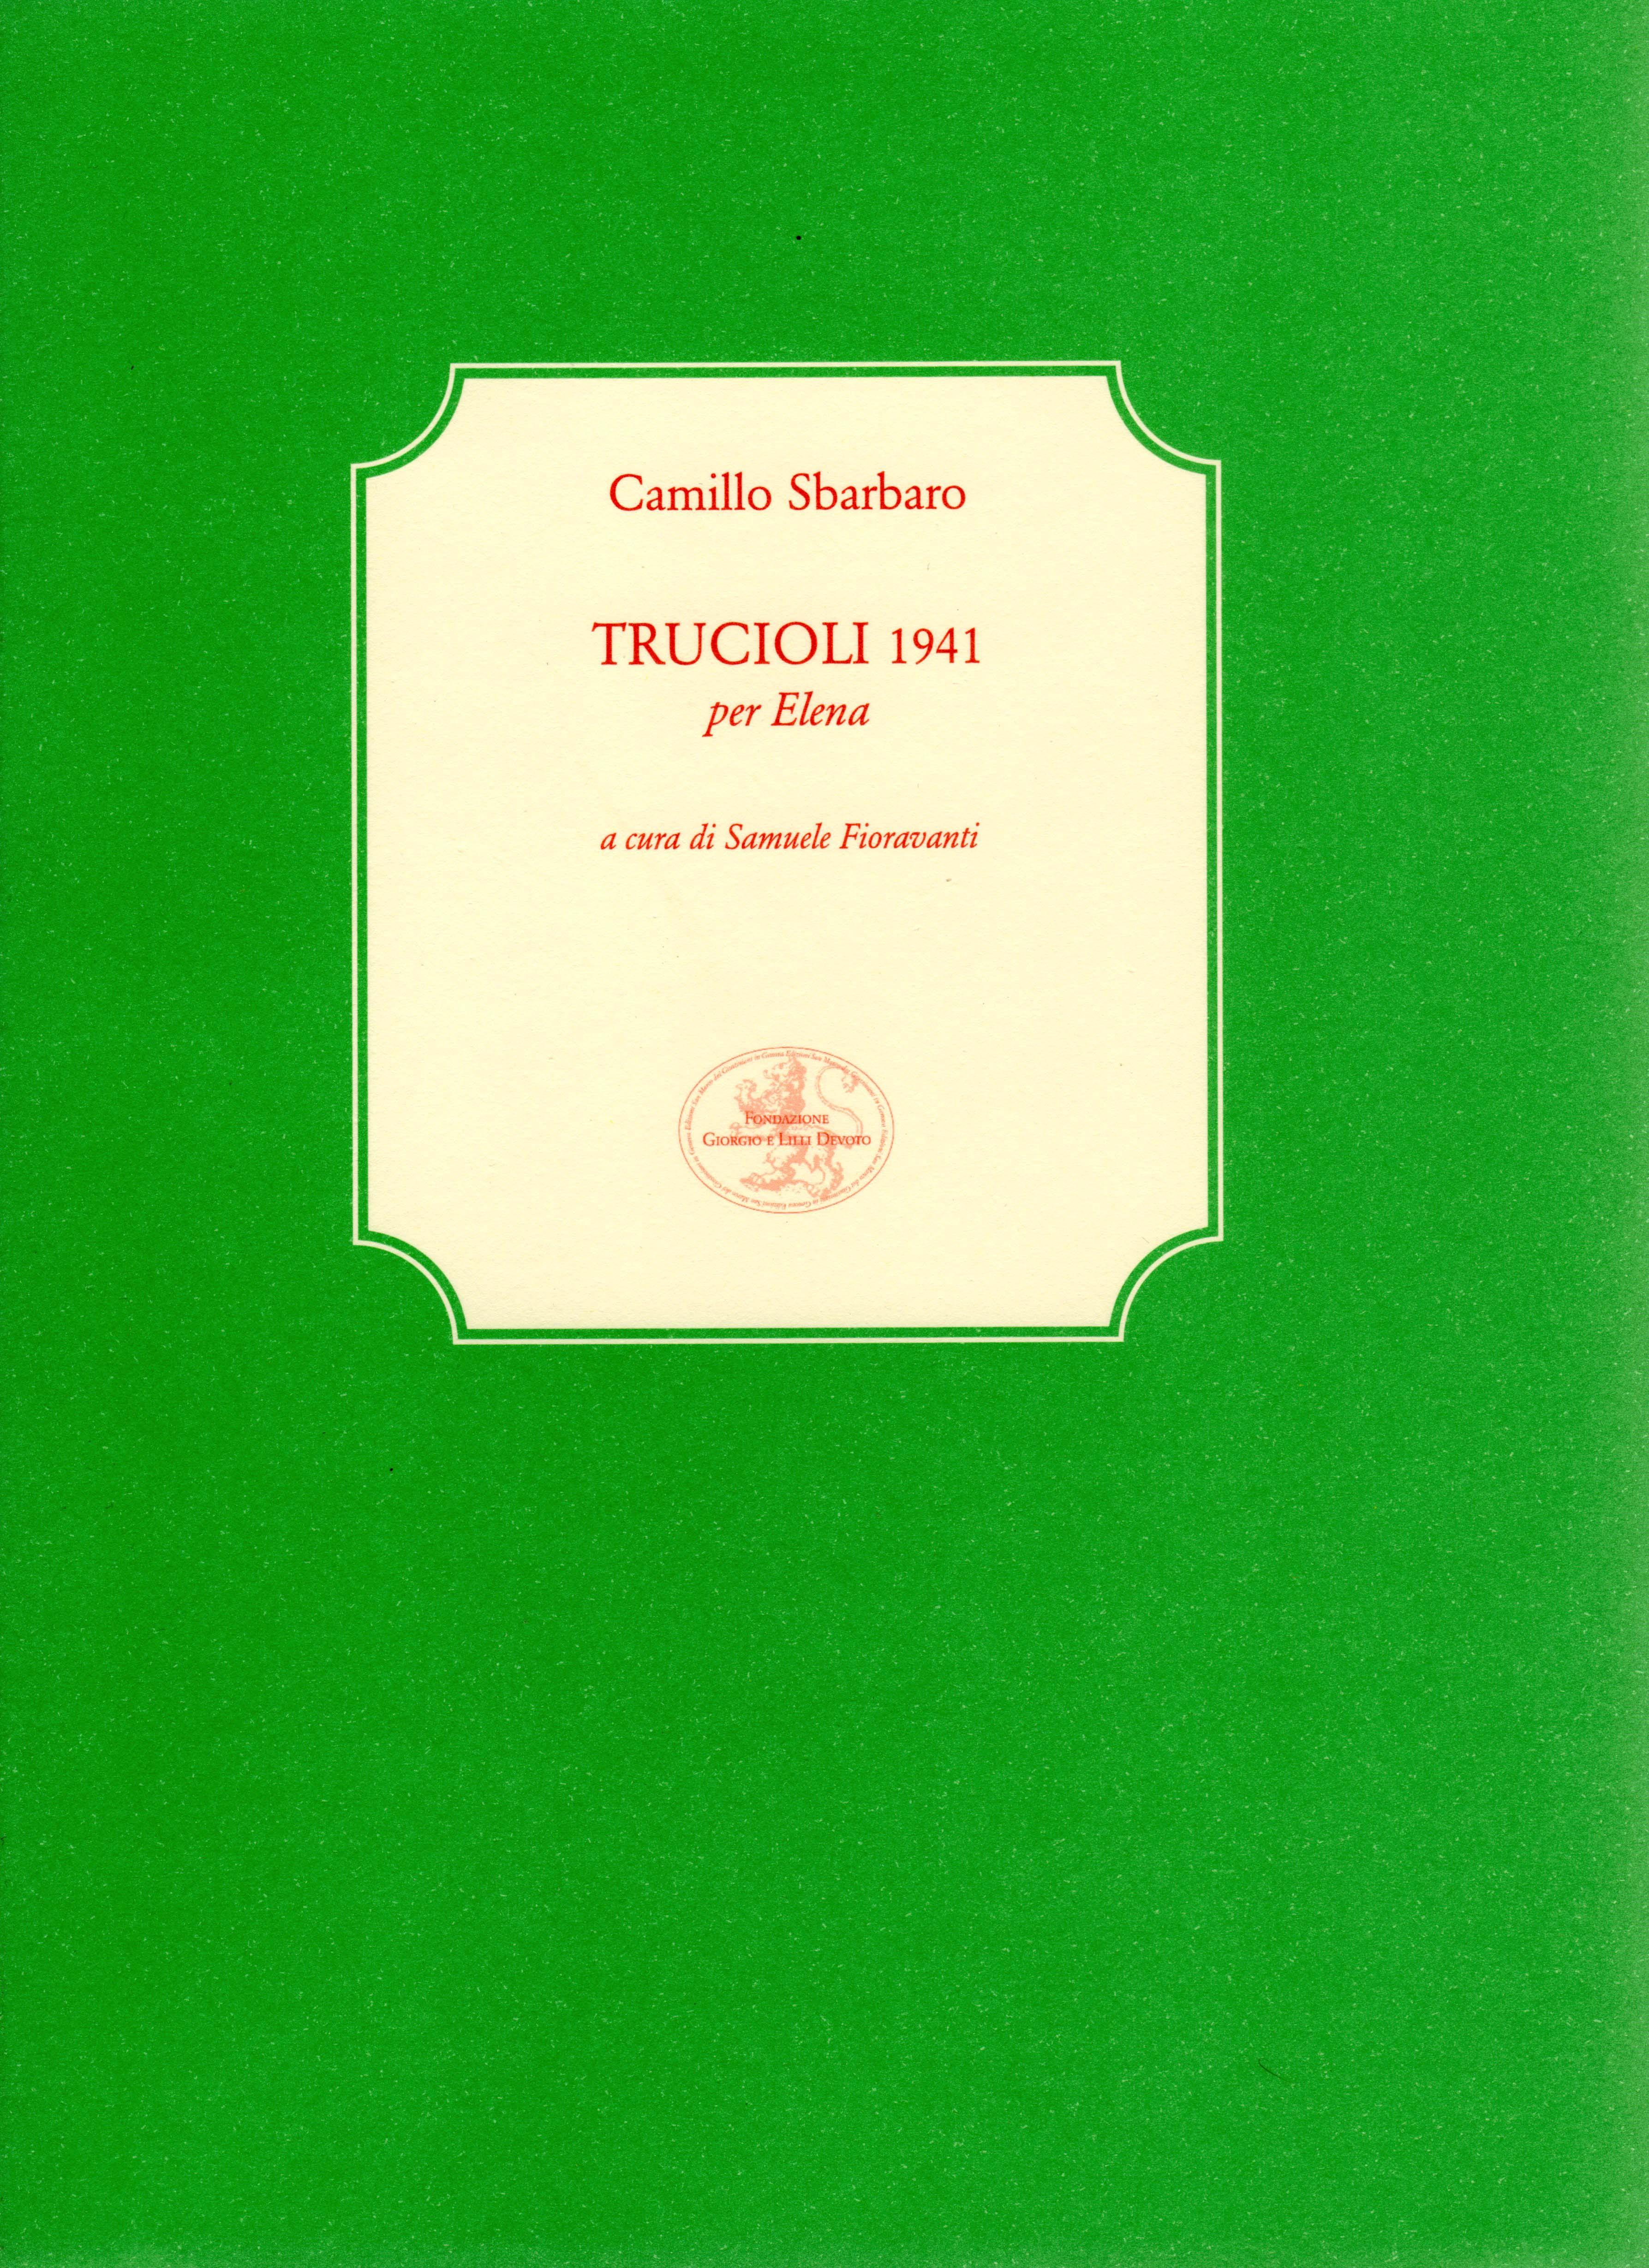 Trucioli 1941 per Elena